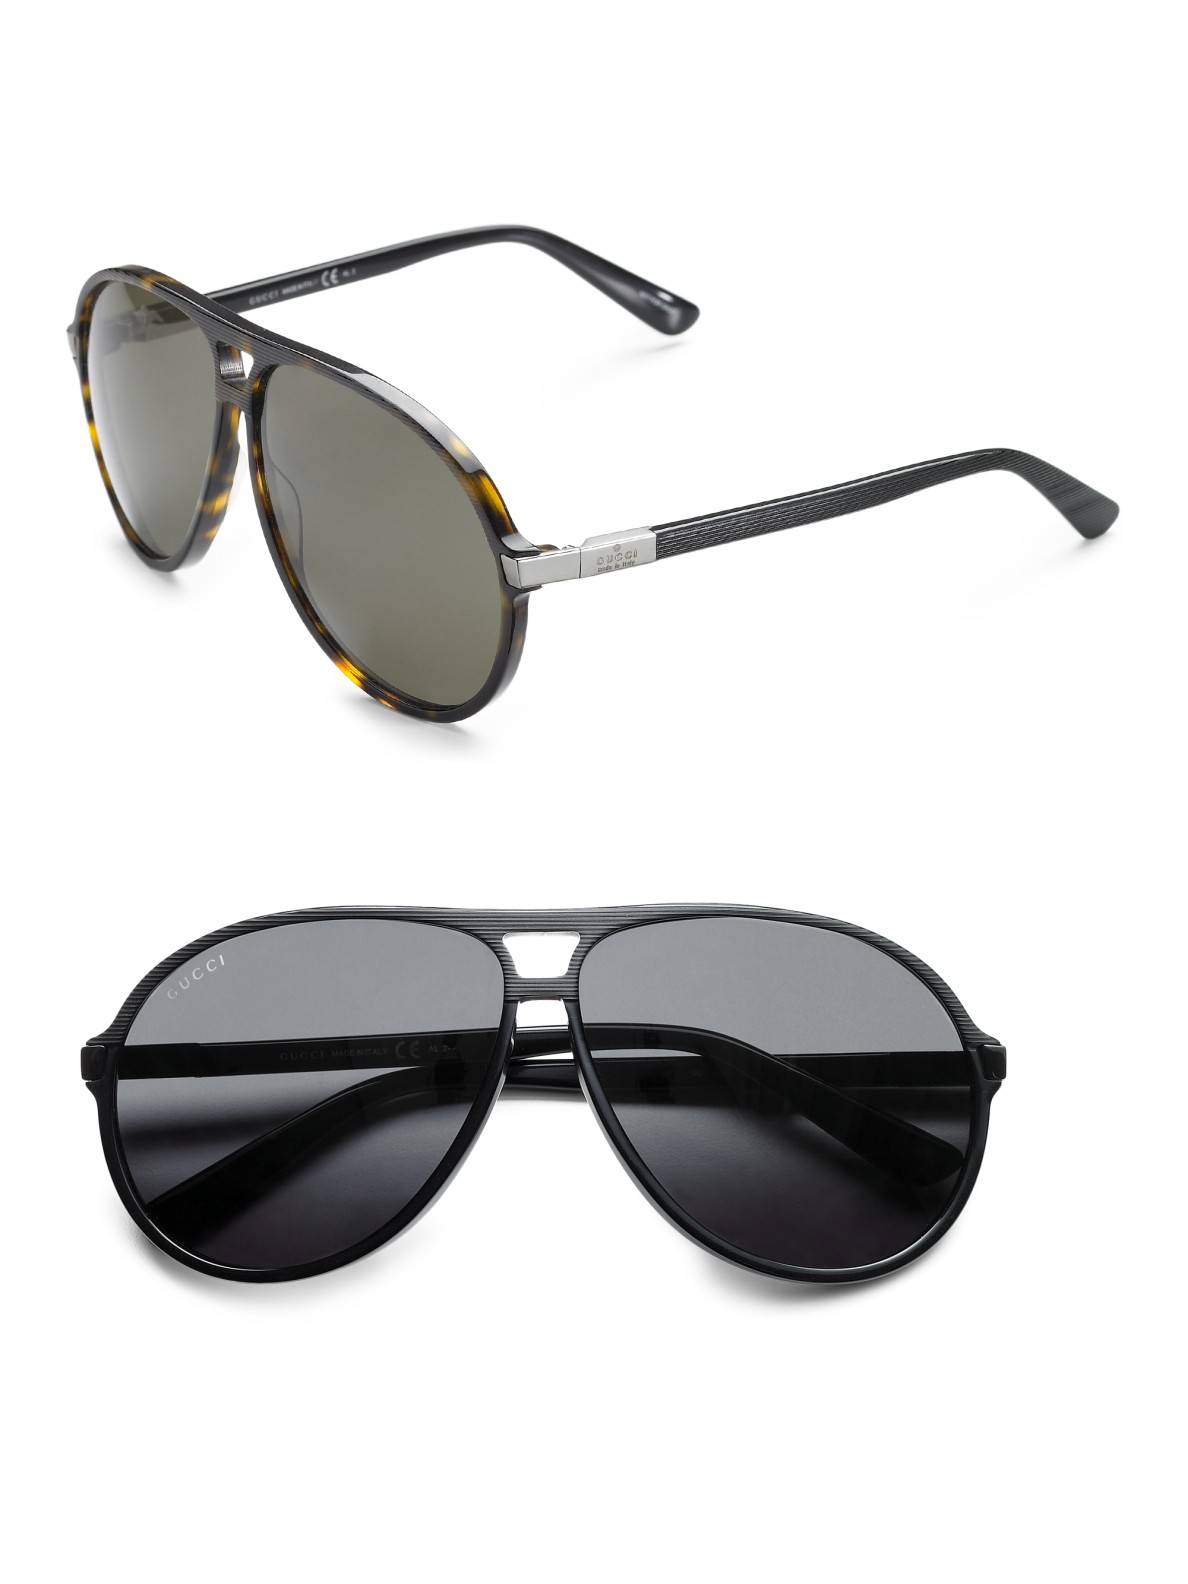 Lyst Gucci Acetate Aviator Sunglasses In Brown For Men